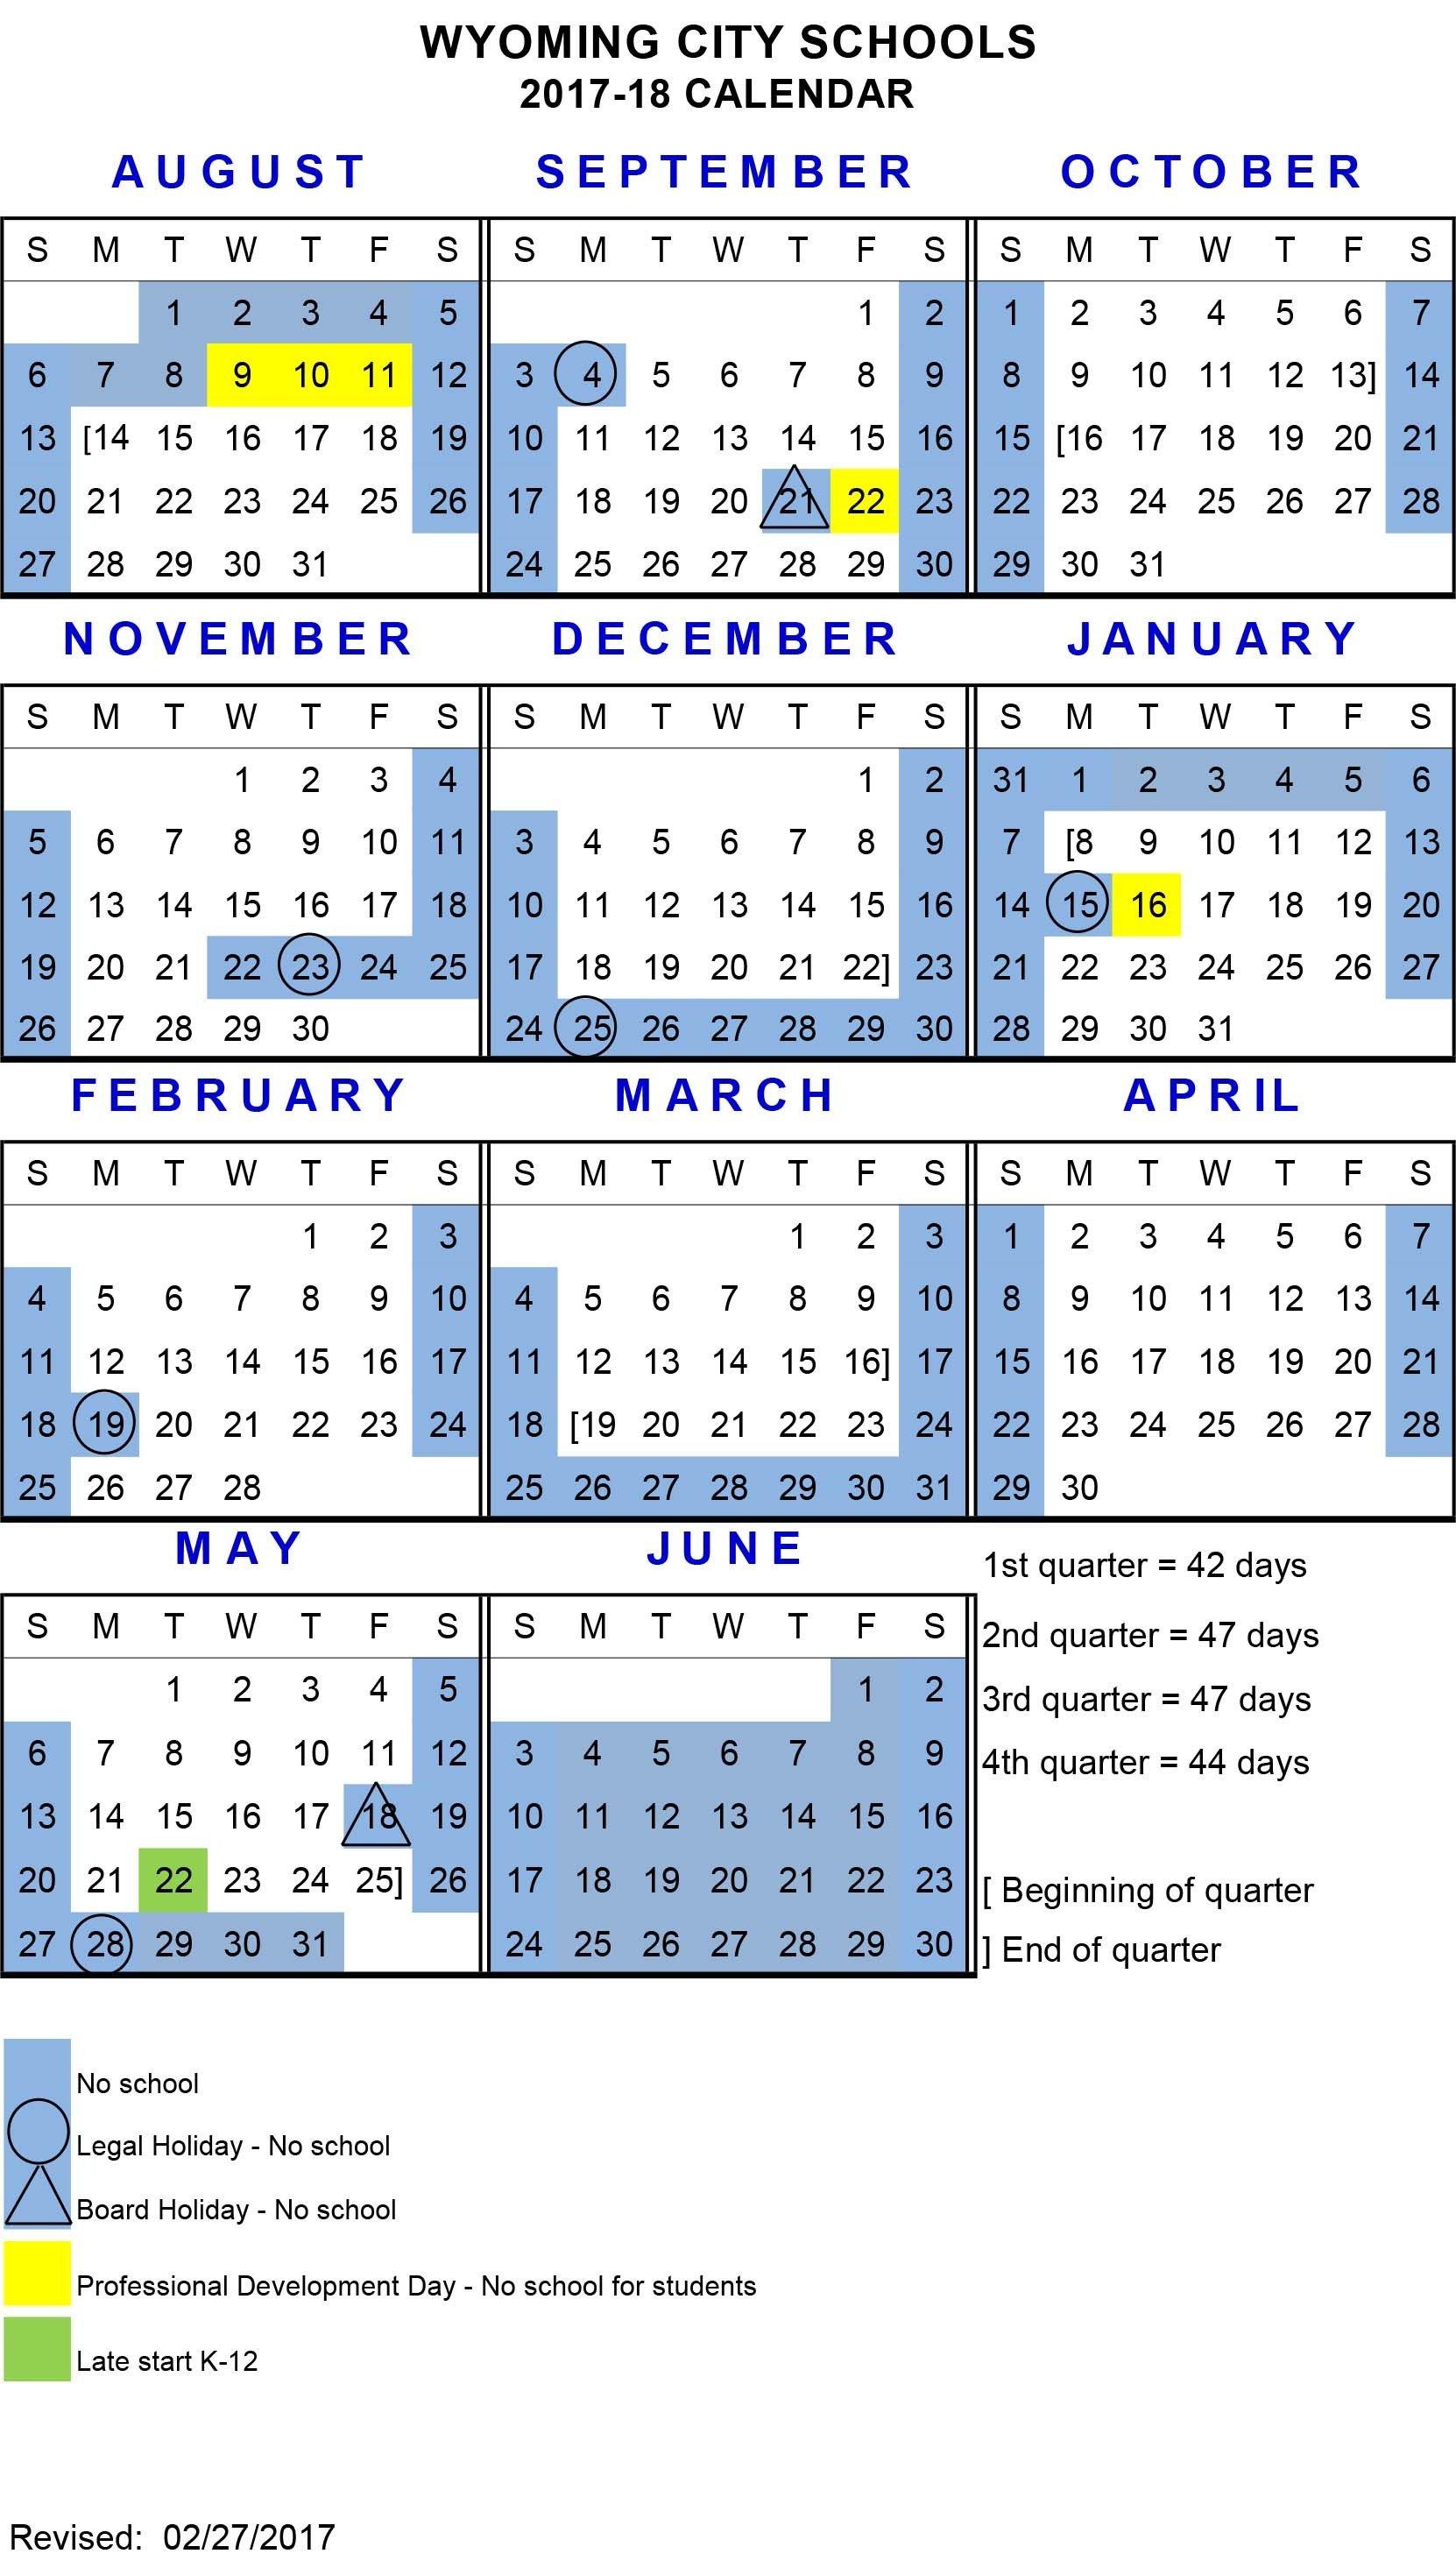 Vt 2018 2019 Calendar Printable For Totally Free – Calendaro.download Calendar 2019 Vt